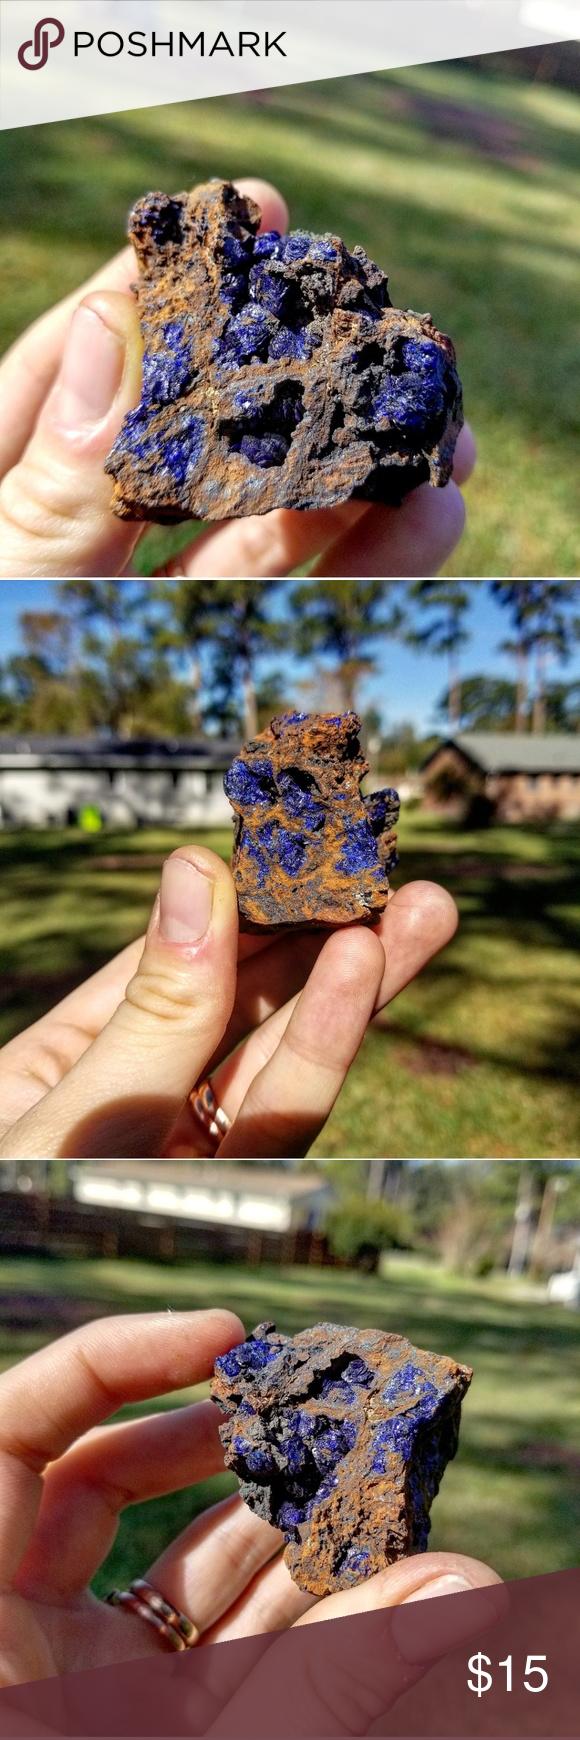 Azurite Mineral | Azurite, Blue and copper, Wire wrapping ...